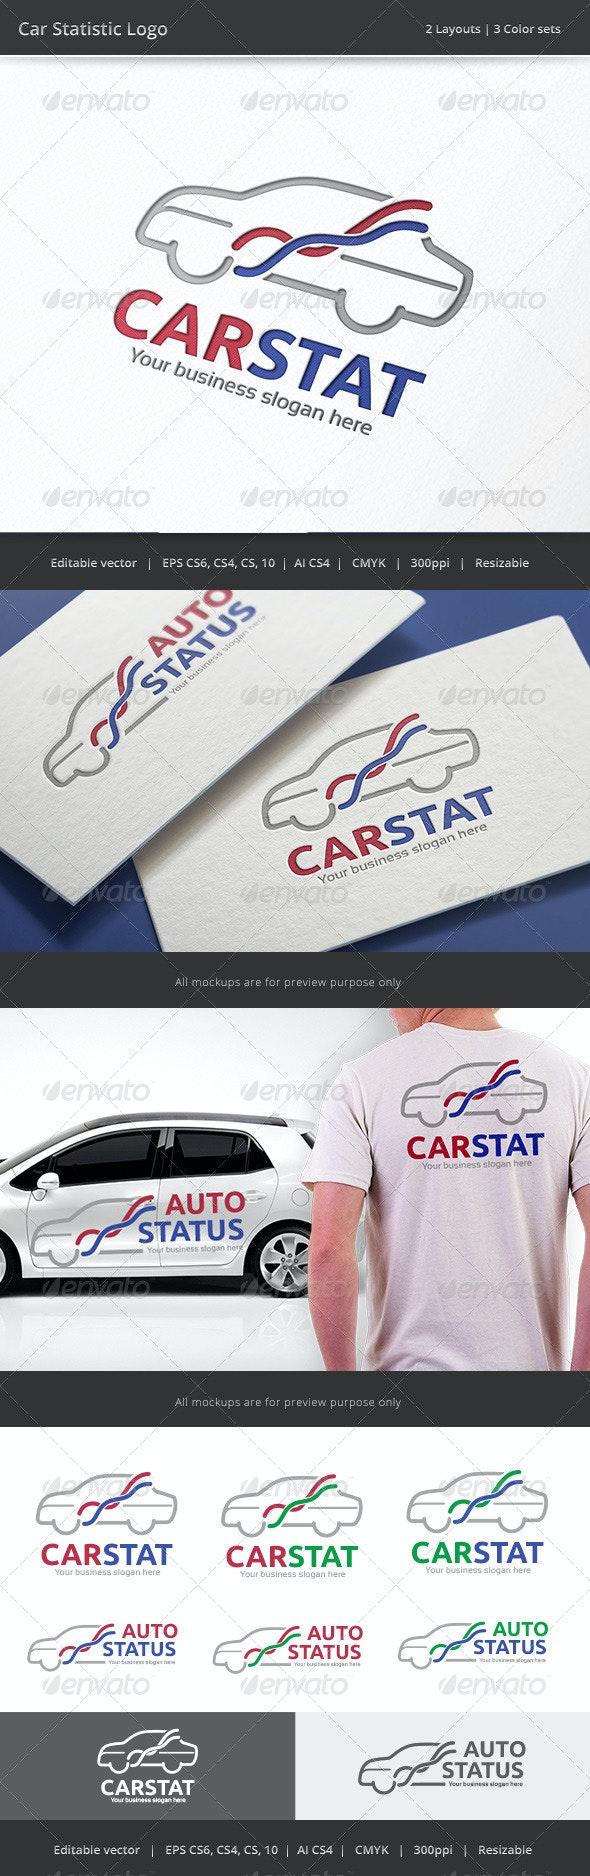 Car Statistic Logo - Objects Logo Templates